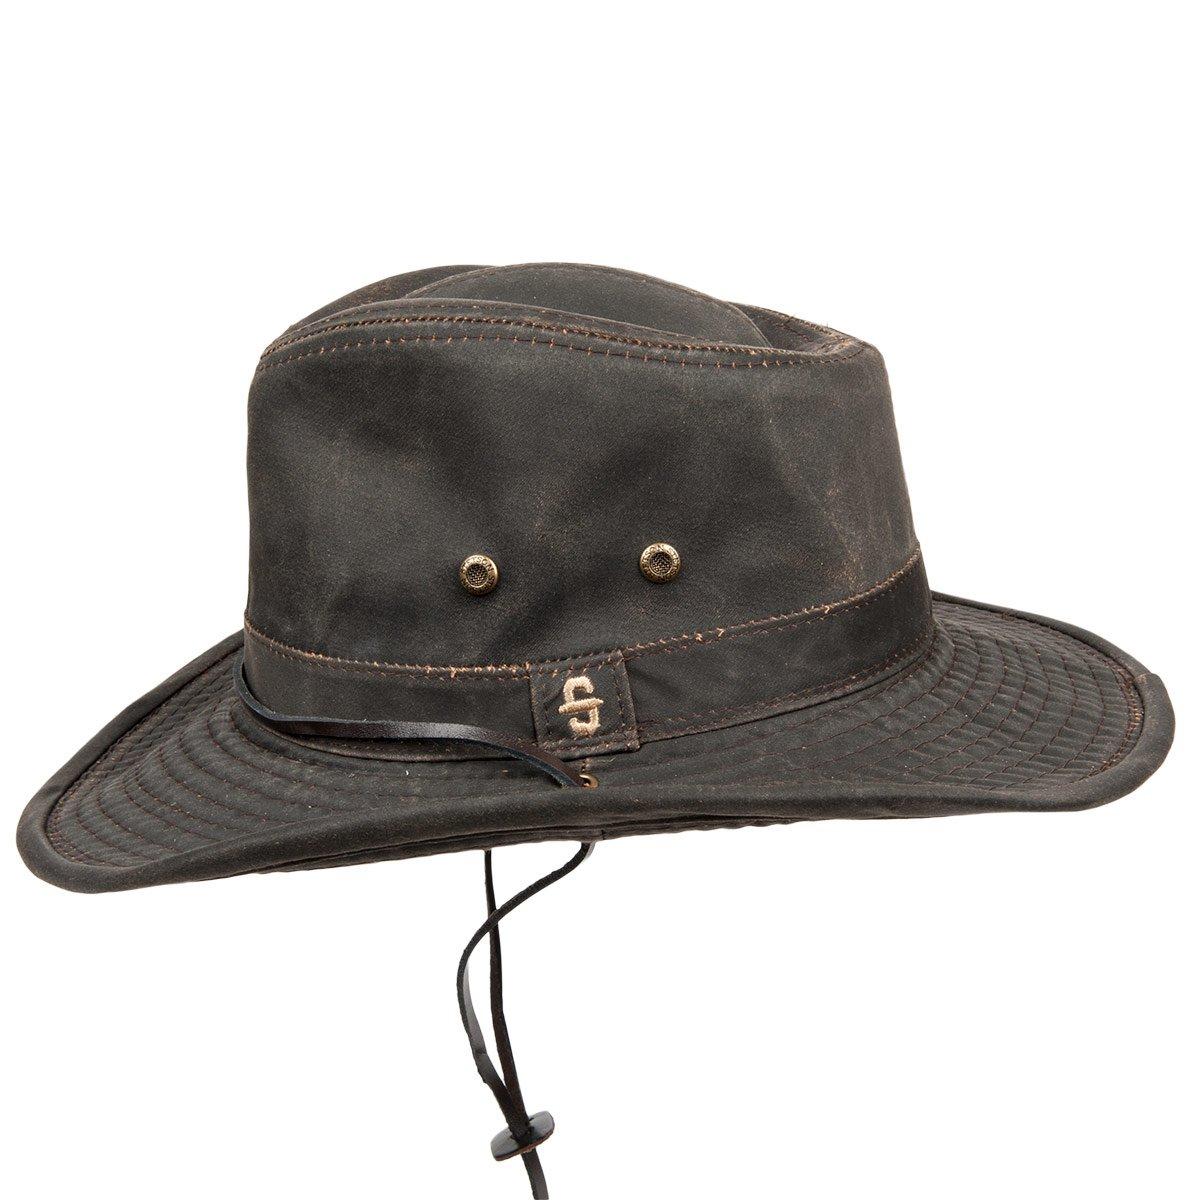 cappello con tesa larga Diaz Cotton firmato Stetson e94bdfbab64b